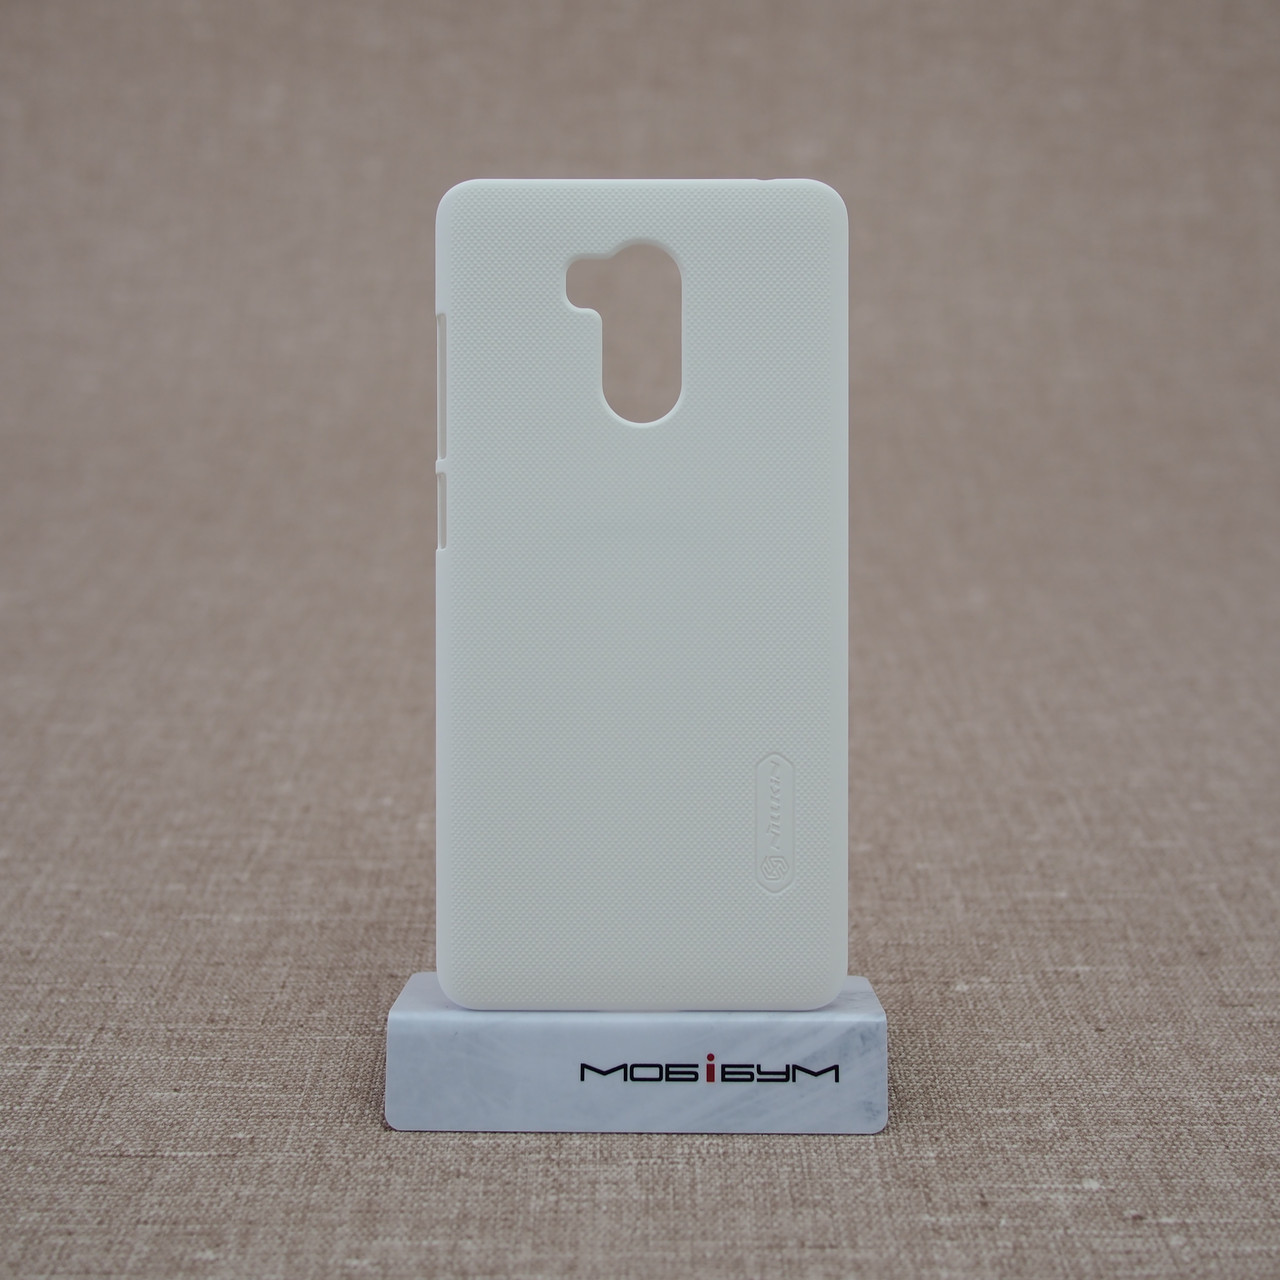 Накладка Nillkin Super Frosted Shield Xiaomi Redmi 4 Pro white EAN/UPC: 6902048133907